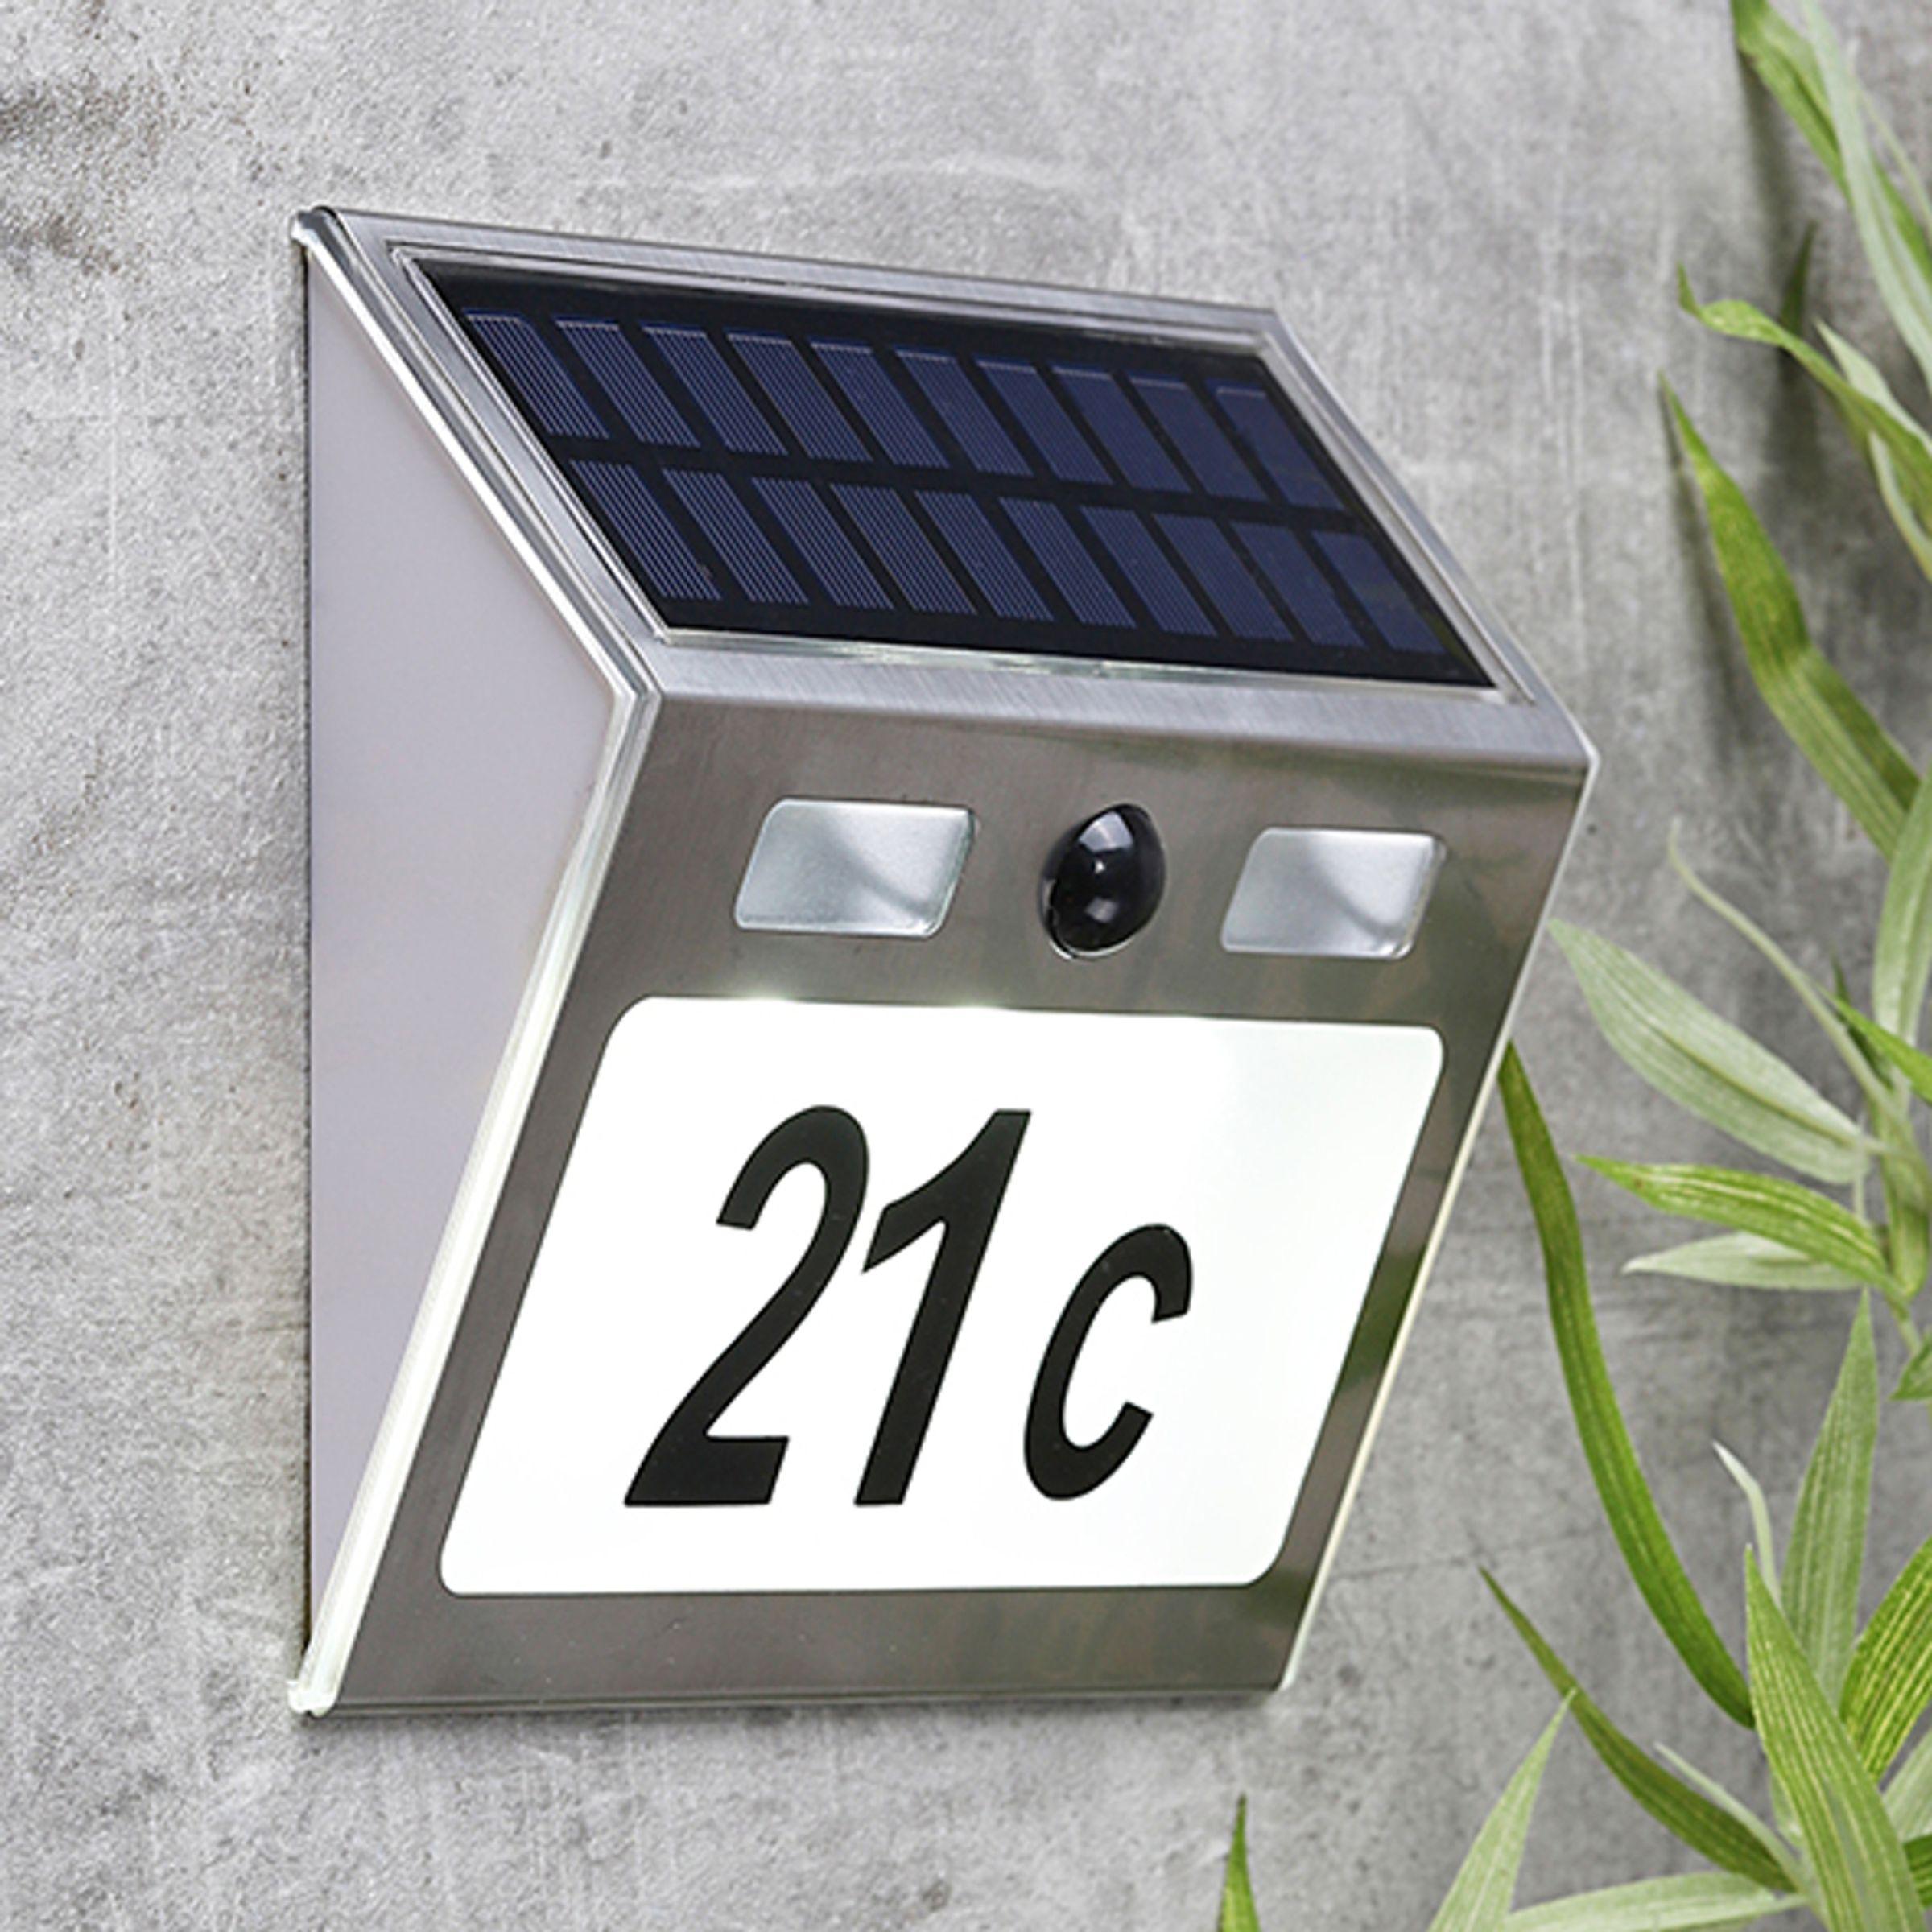 Hausnummer Solar Led : led solar hausnummer nummer mit bewegungsmelder bewegungssensor ebay ~ Yuntae.com Dekorationen Ideen